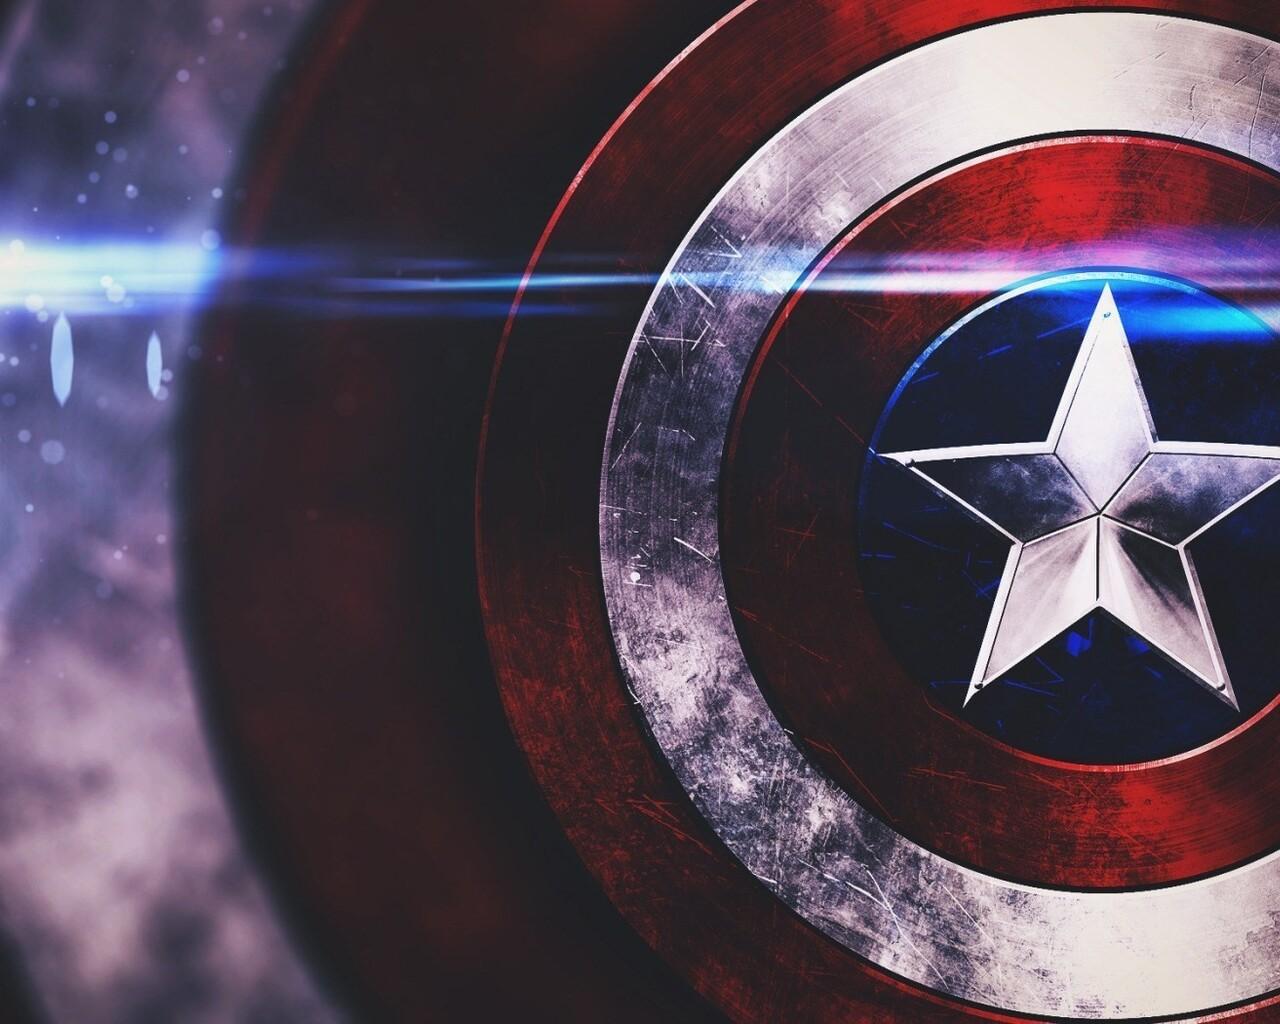 1280x1024 captain america shield 1280x1024 resolution hd